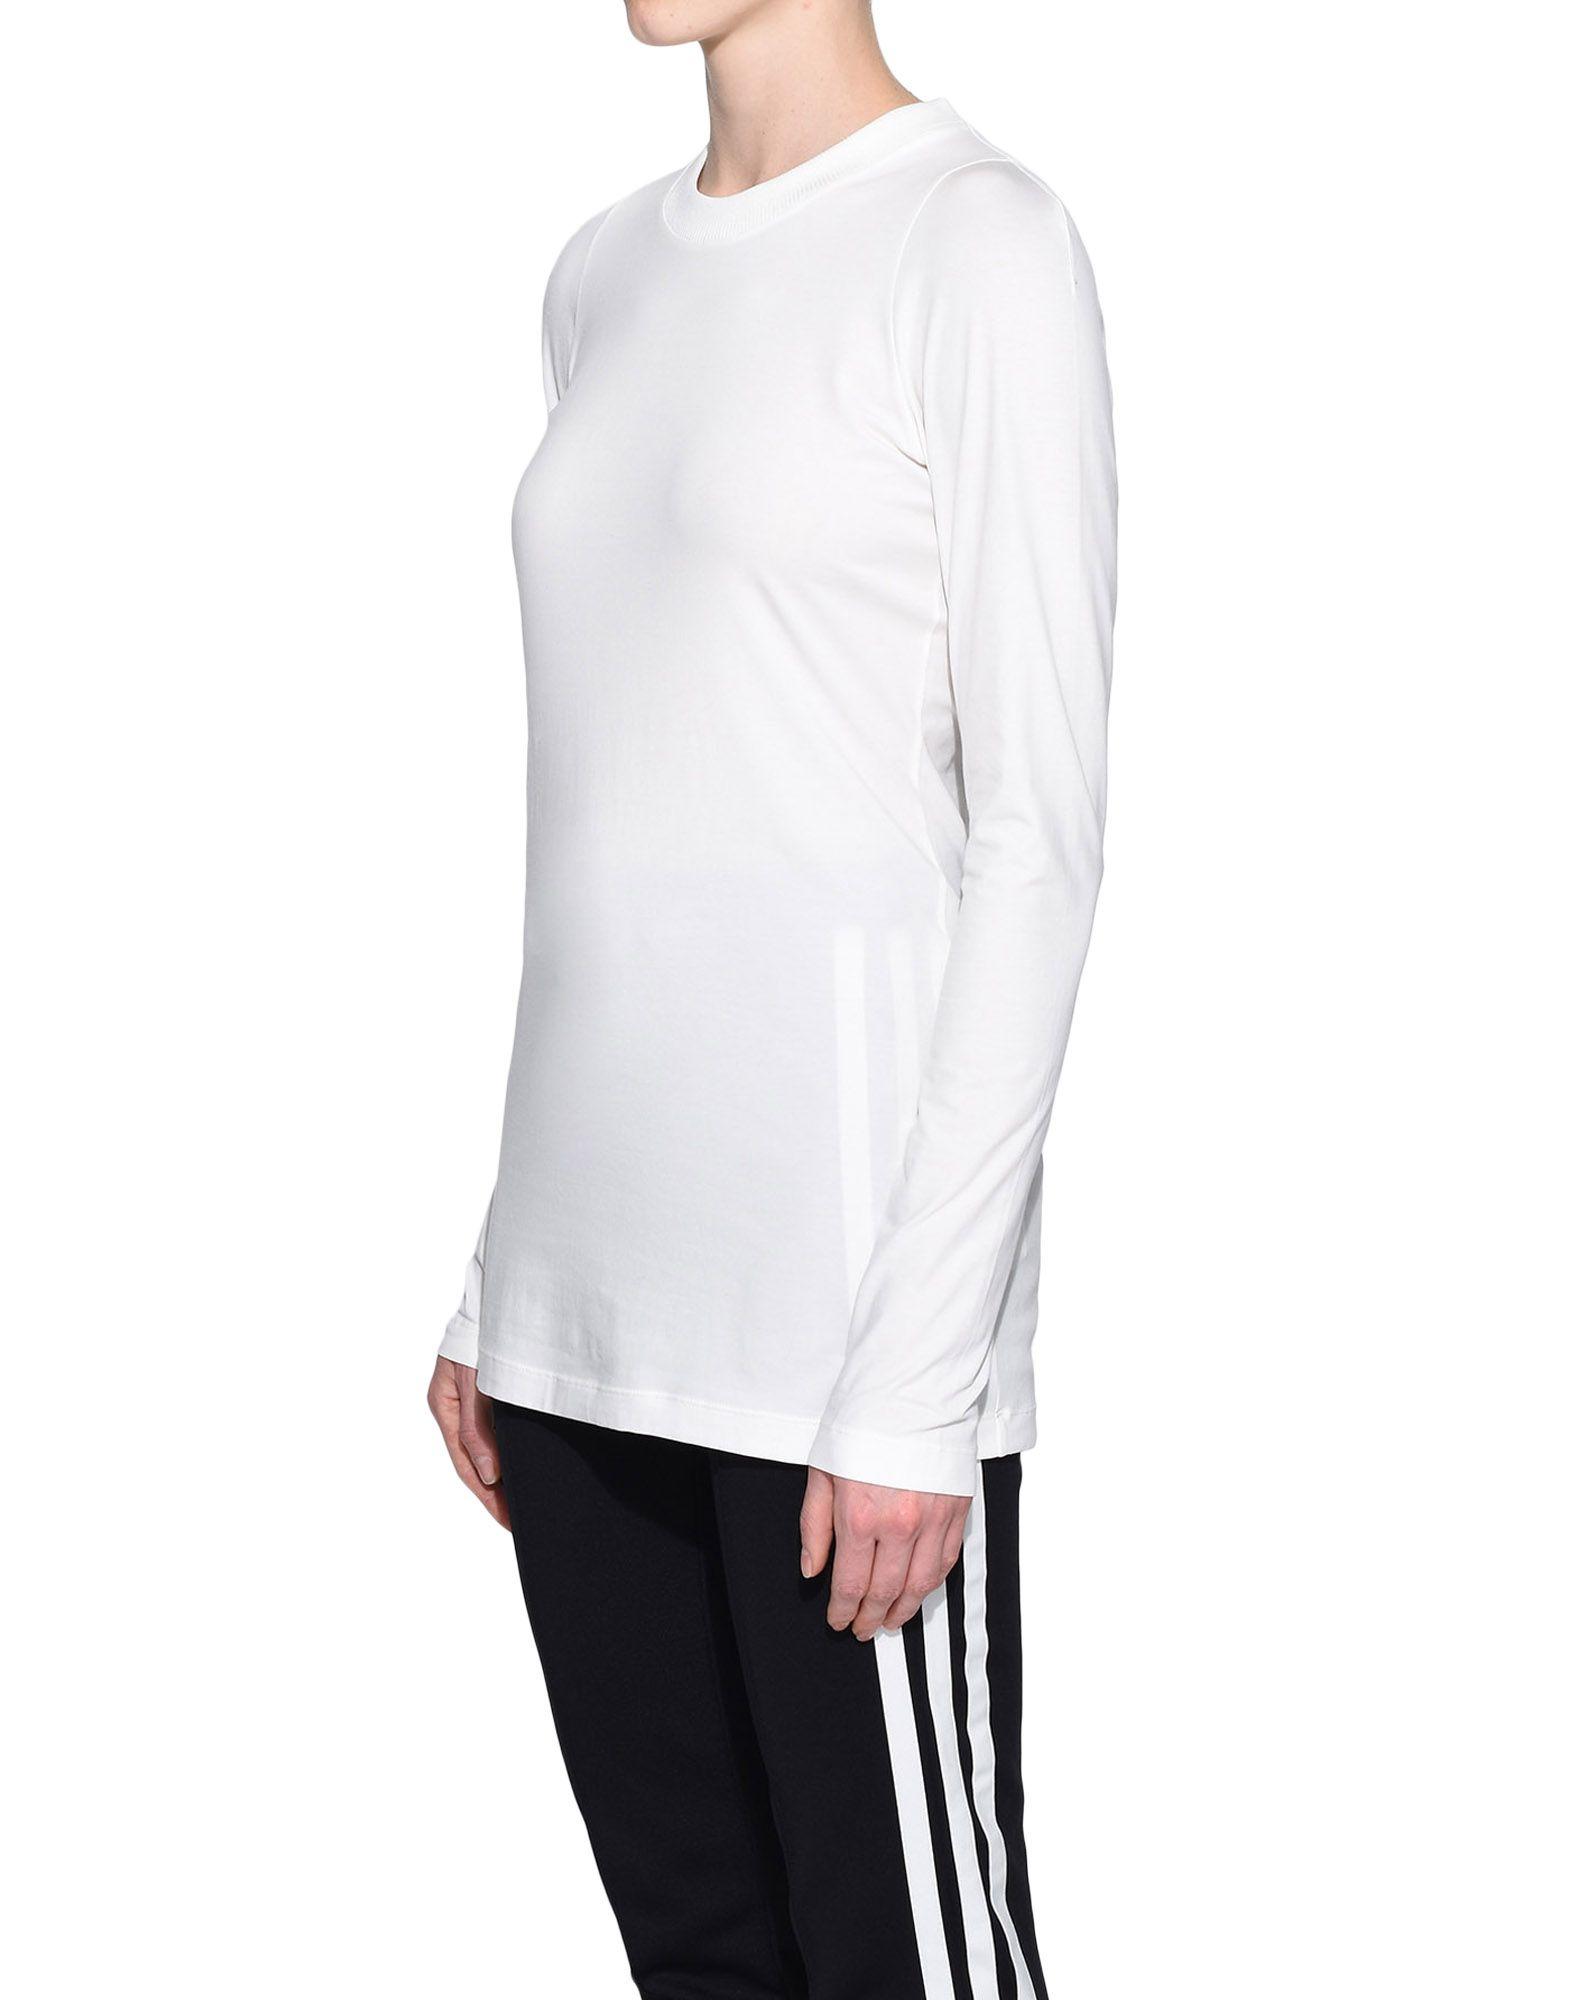 Y-3 Y-3 Prime Tee Long sleeve t-shirt Woman e